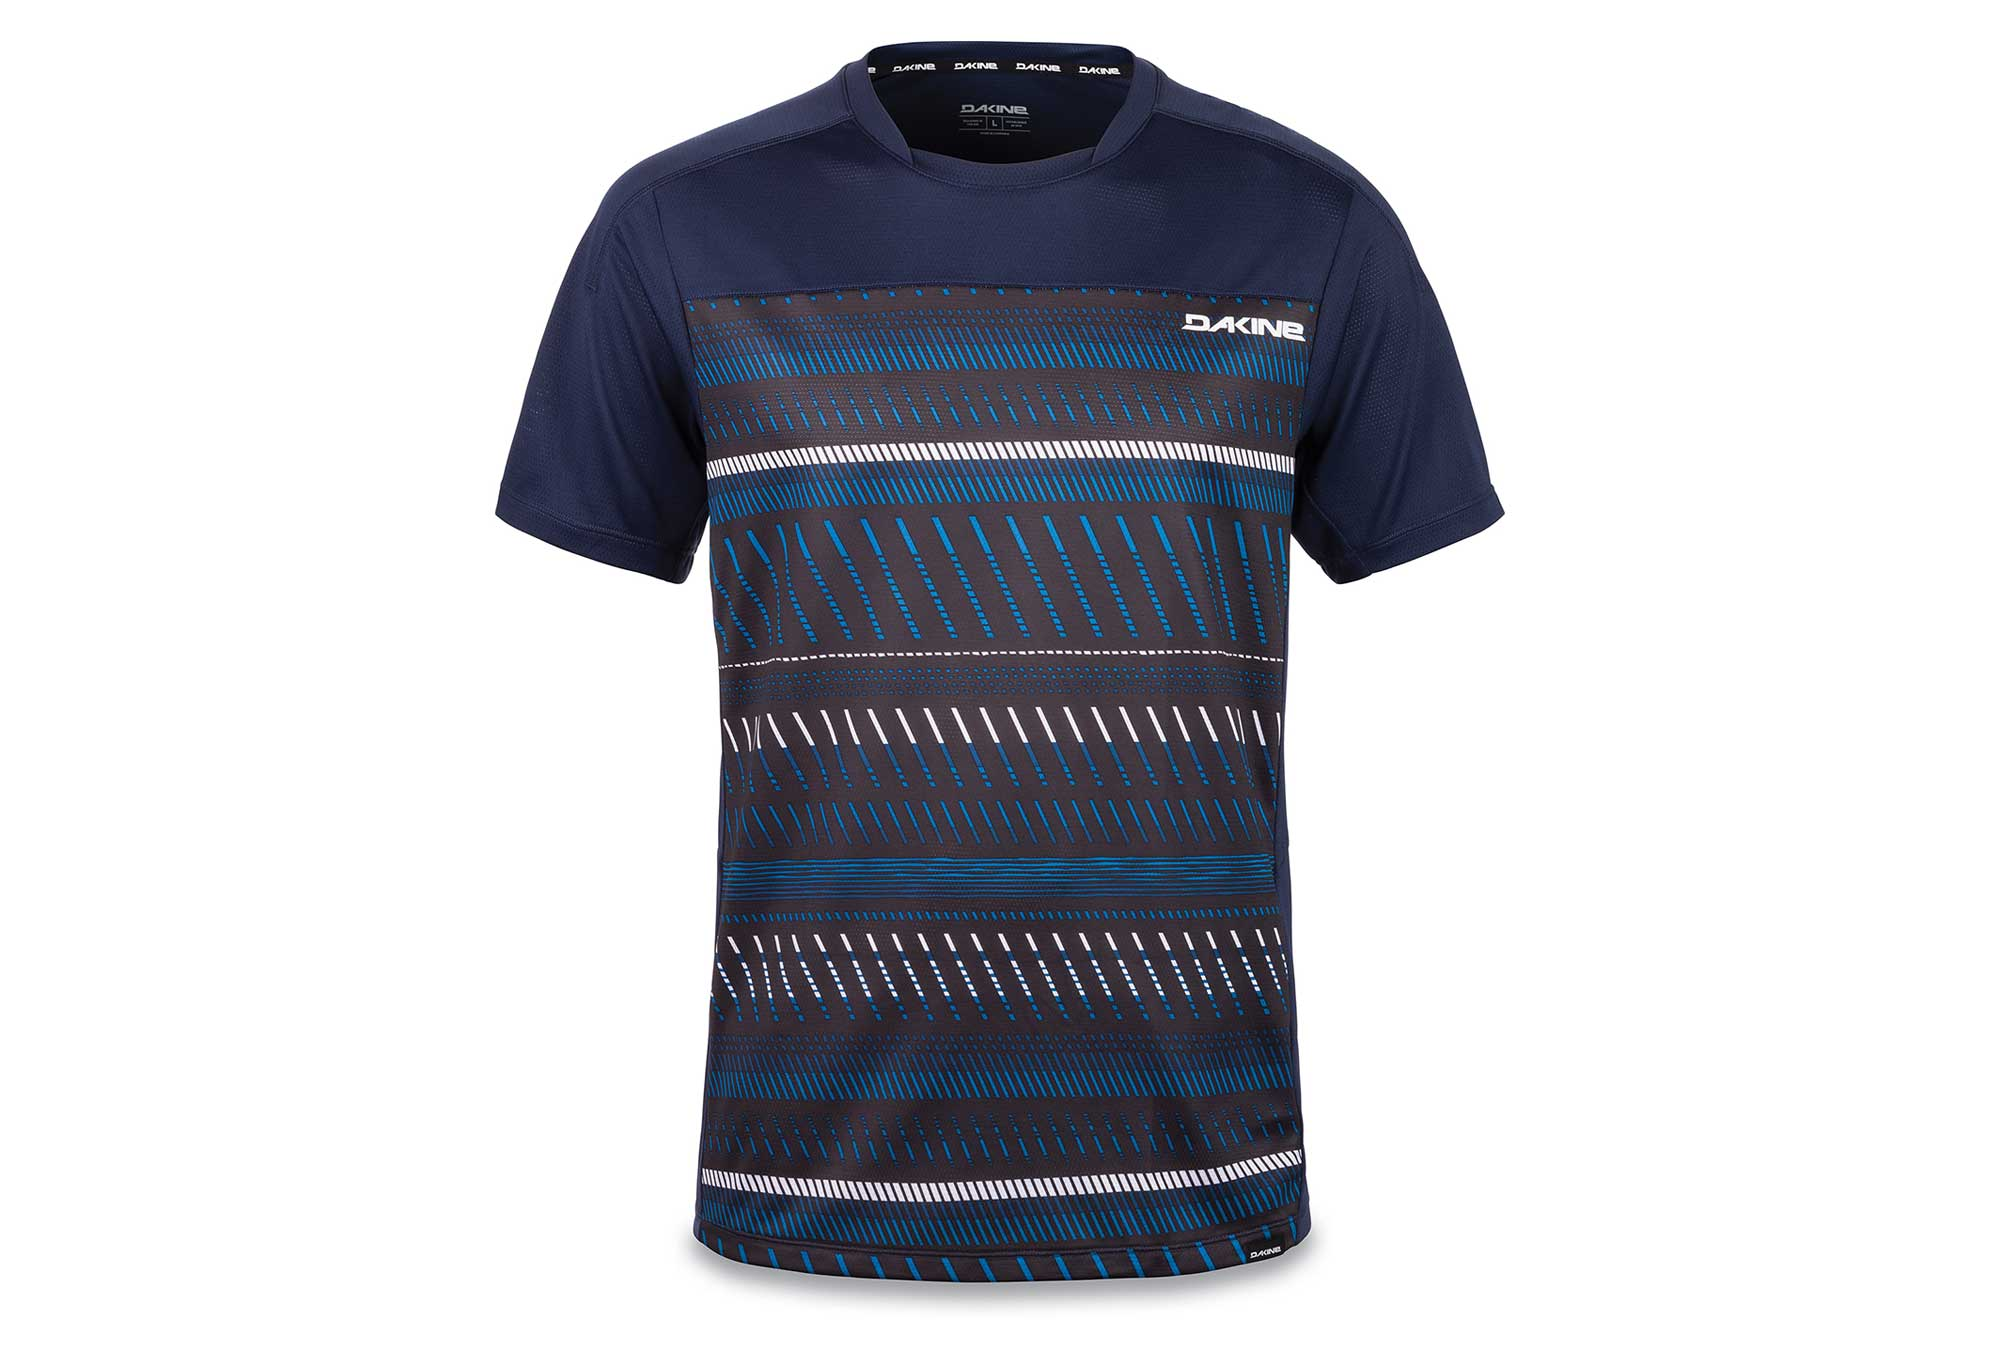 Dakine Charger Ventana Short Sleeves Jersey Blue  64b7eecf5